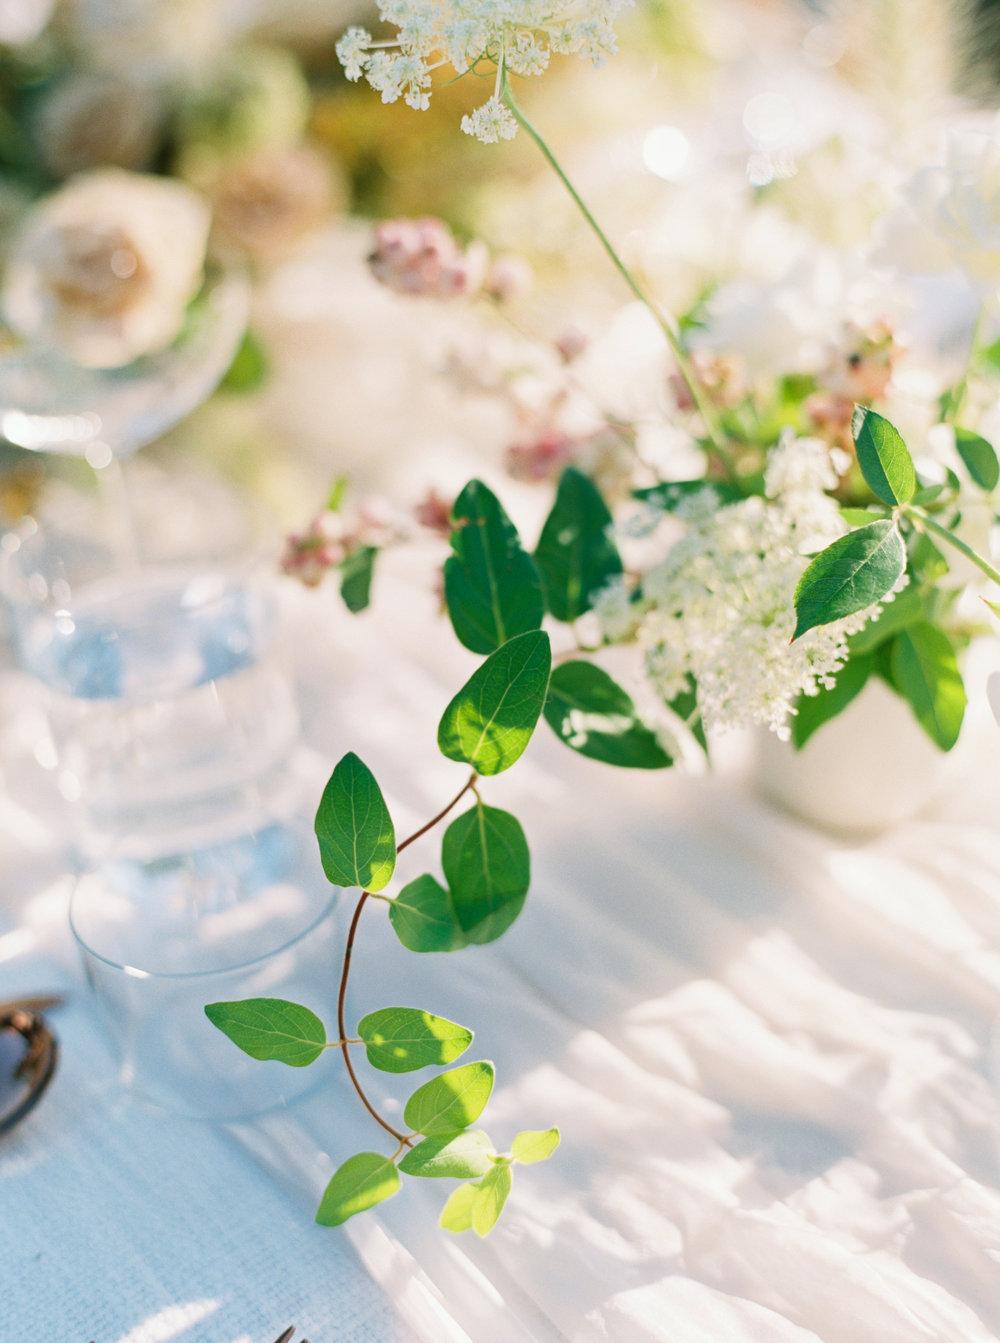 12th-Table-BIG-SUR-WEDDING-Erich-McVey-15